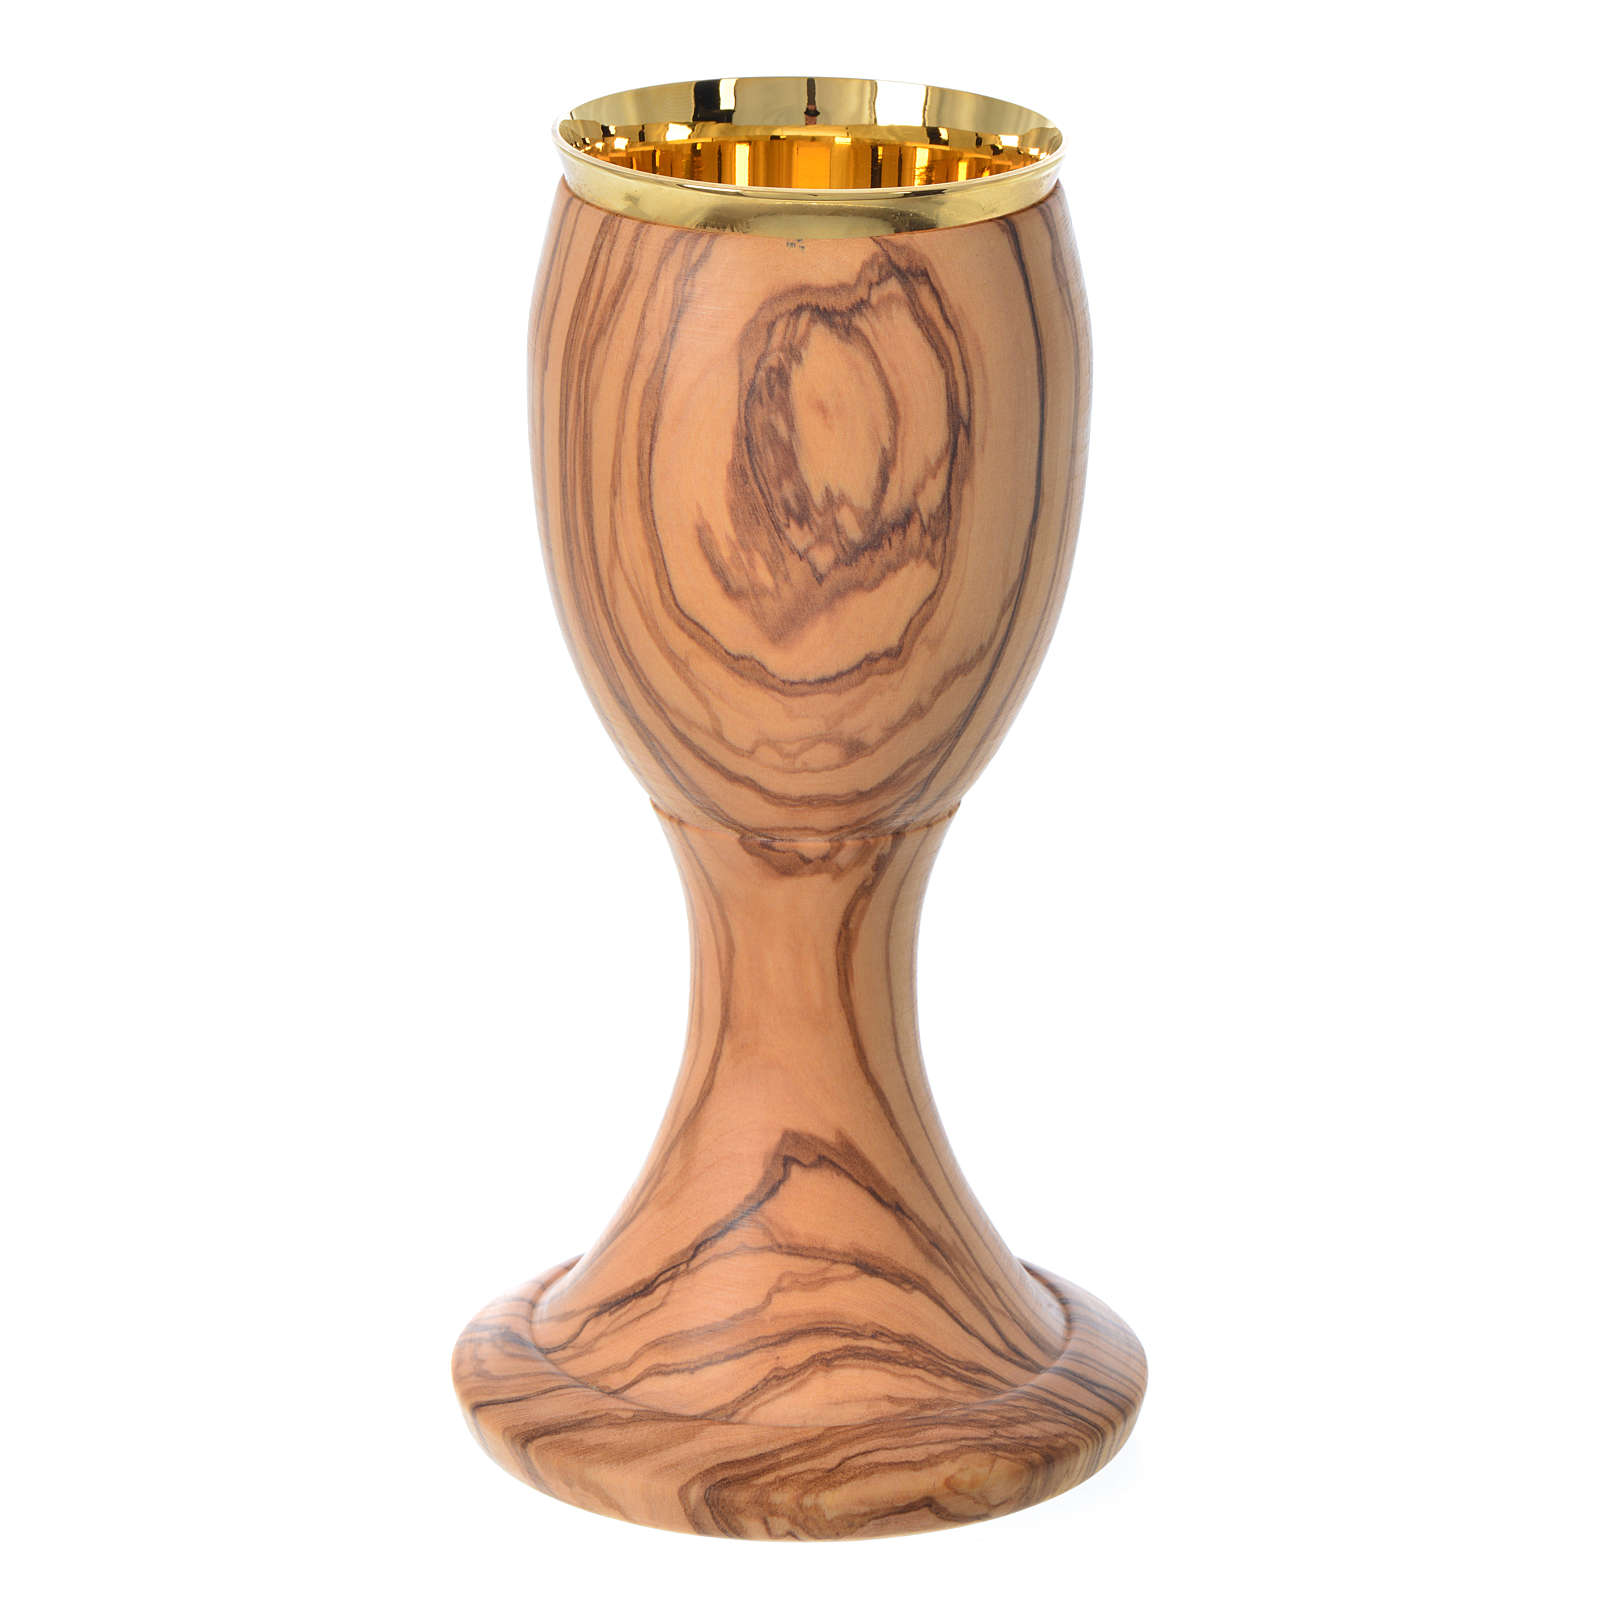 Cáliz de madera estacionada de olivo de Asís 16cm 4